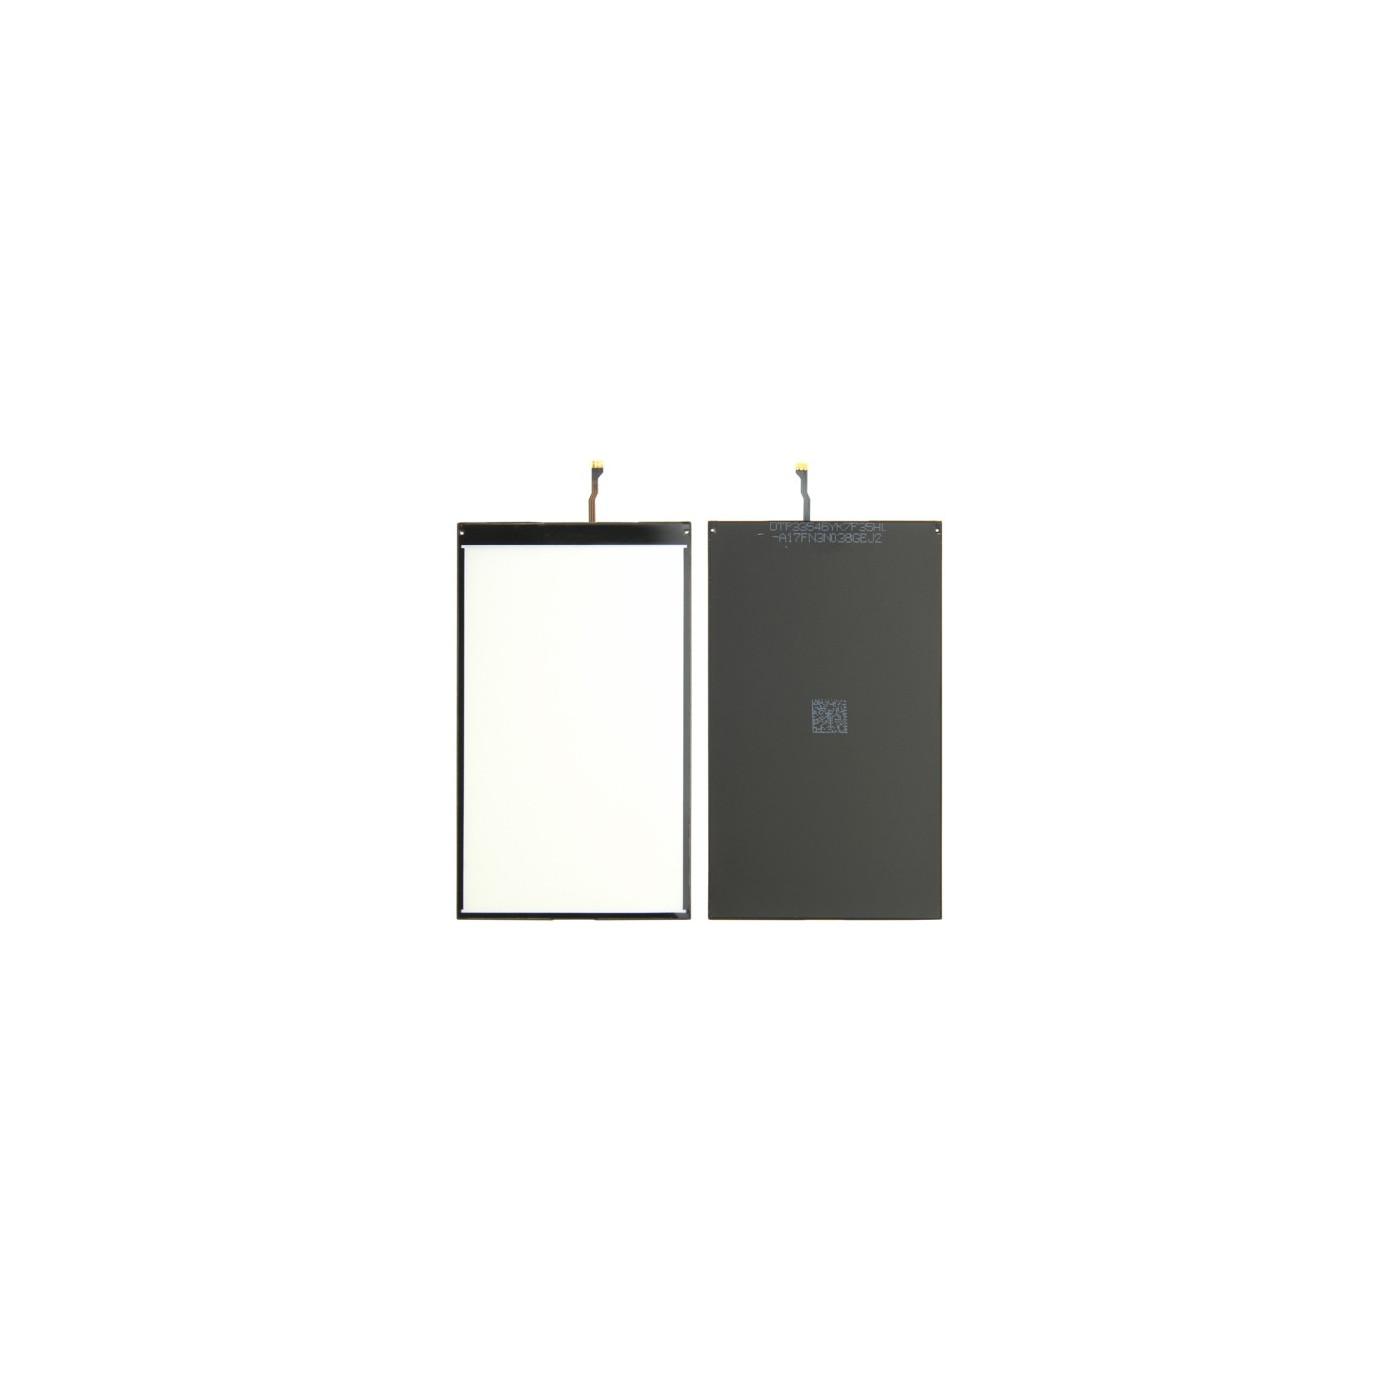 BACKLIGHT BACKLIGHT LCD PANEL LIGHT IPHONE 5S